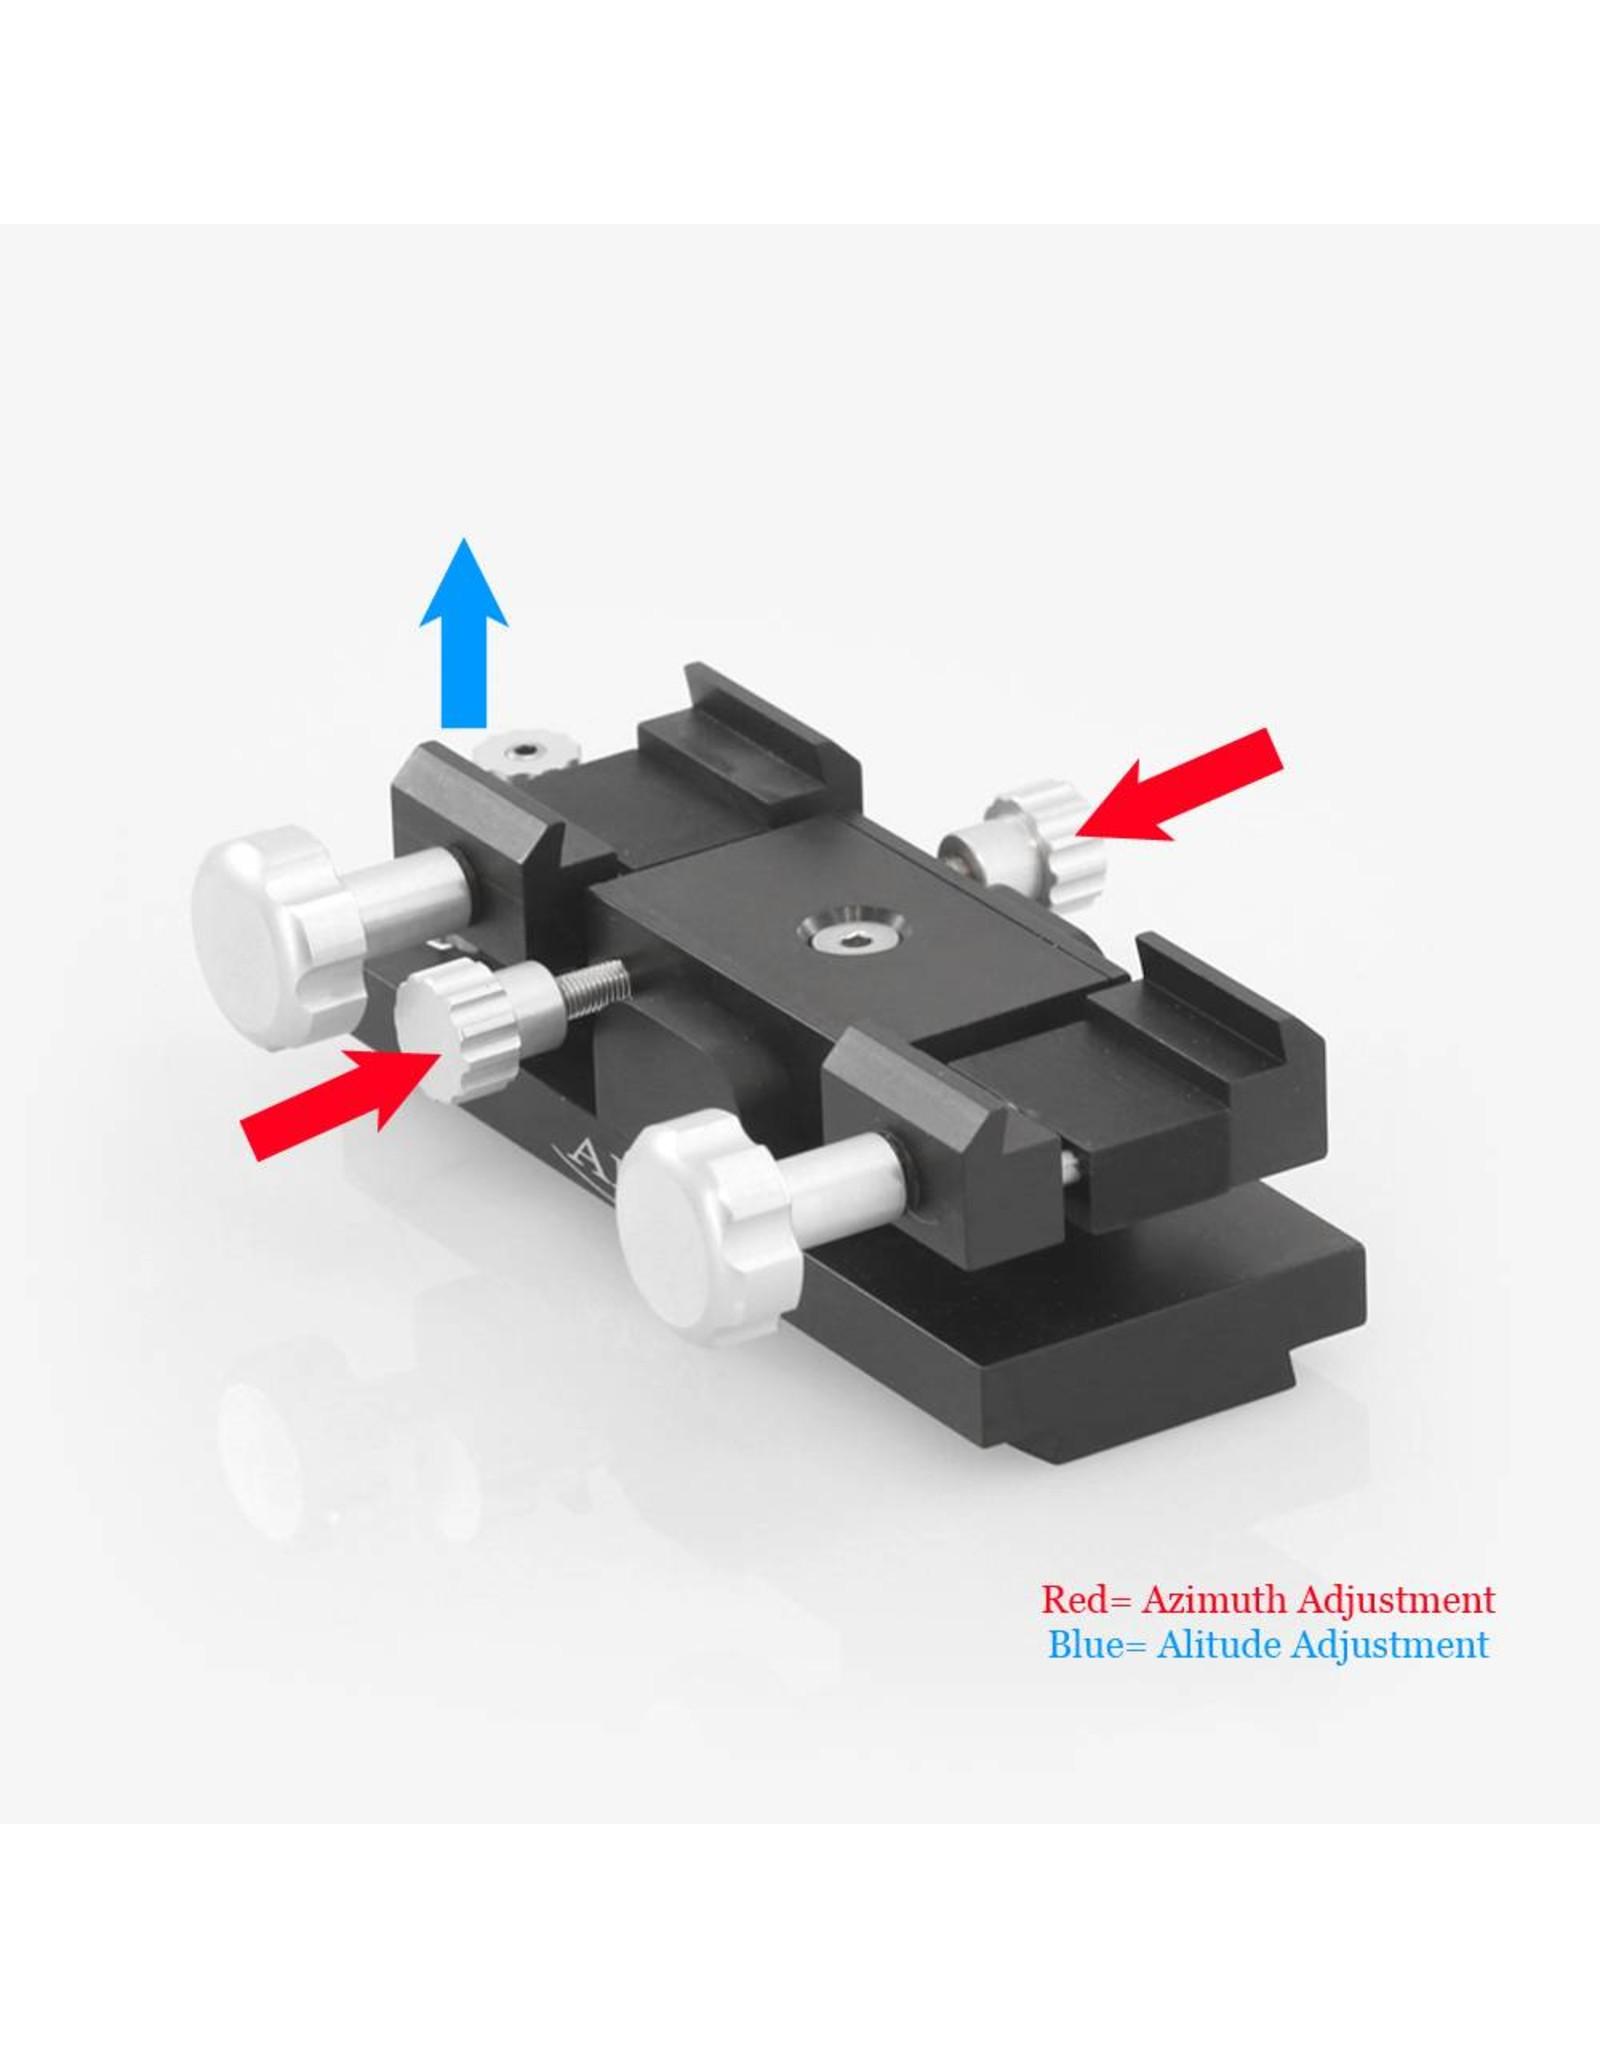 ADM ADM Mini-MAX ALT/AZ Aiming Device Male Dovetail Version